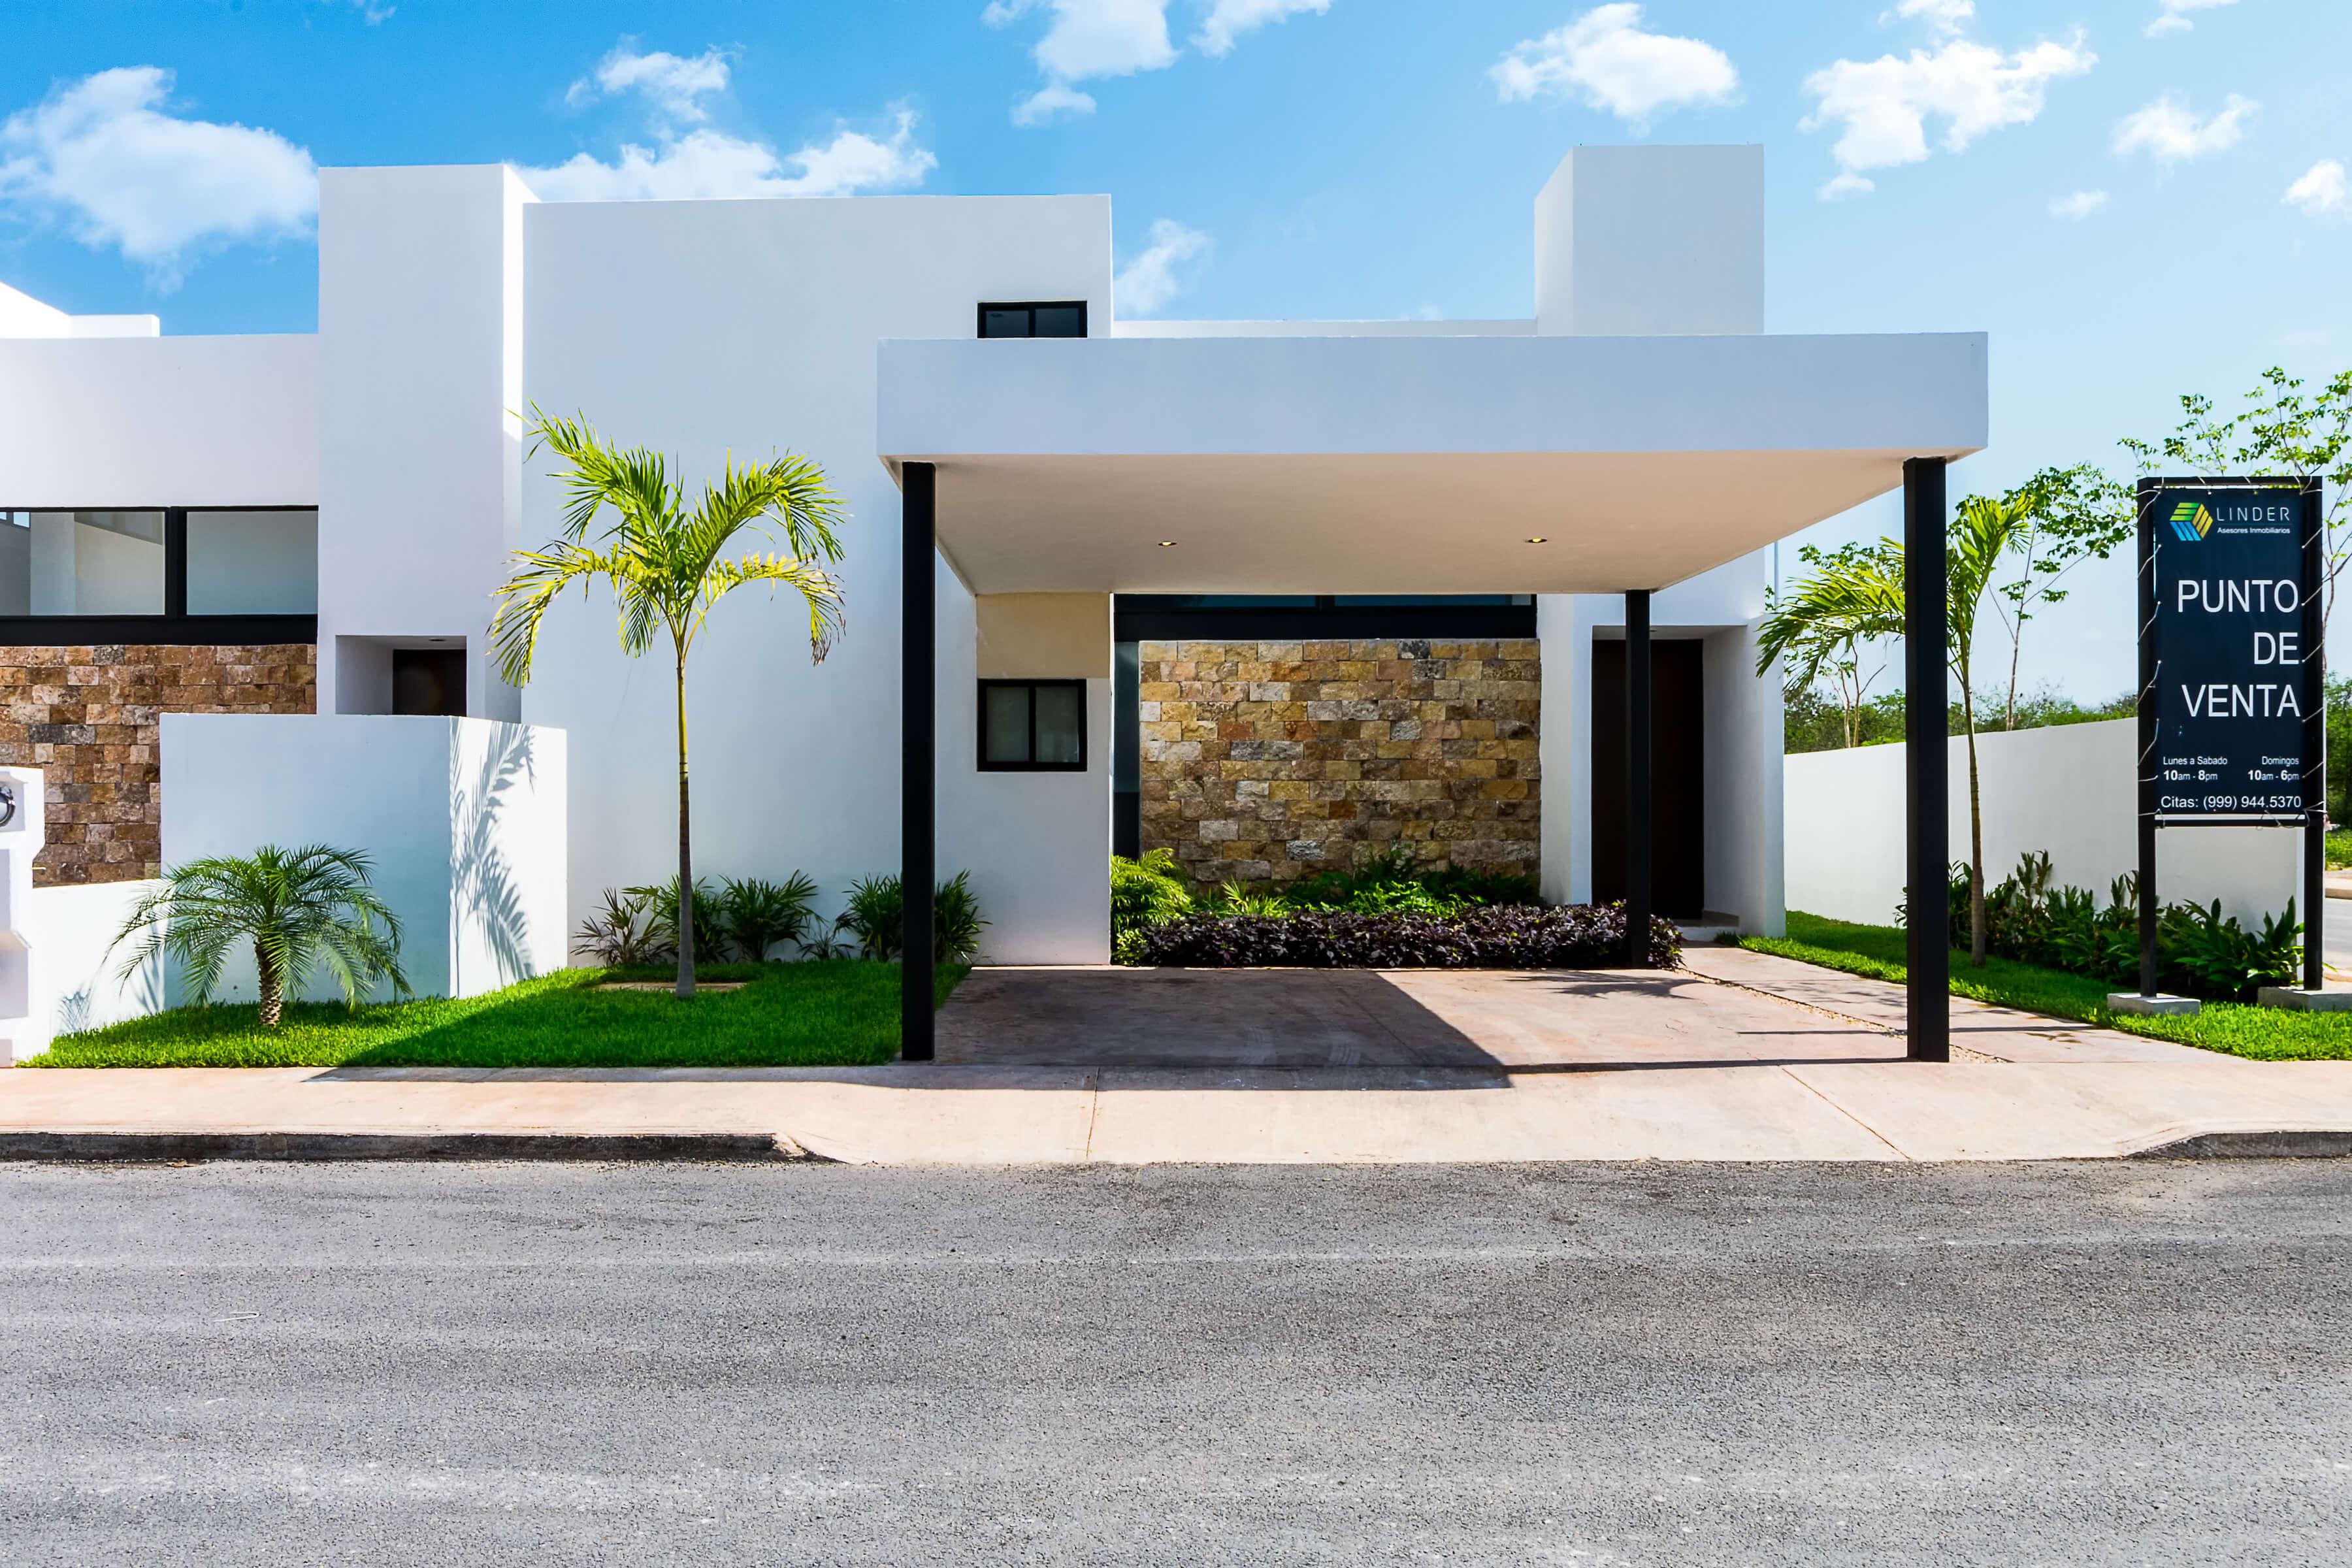 Casas Venta Mérida Alzare Goodlers